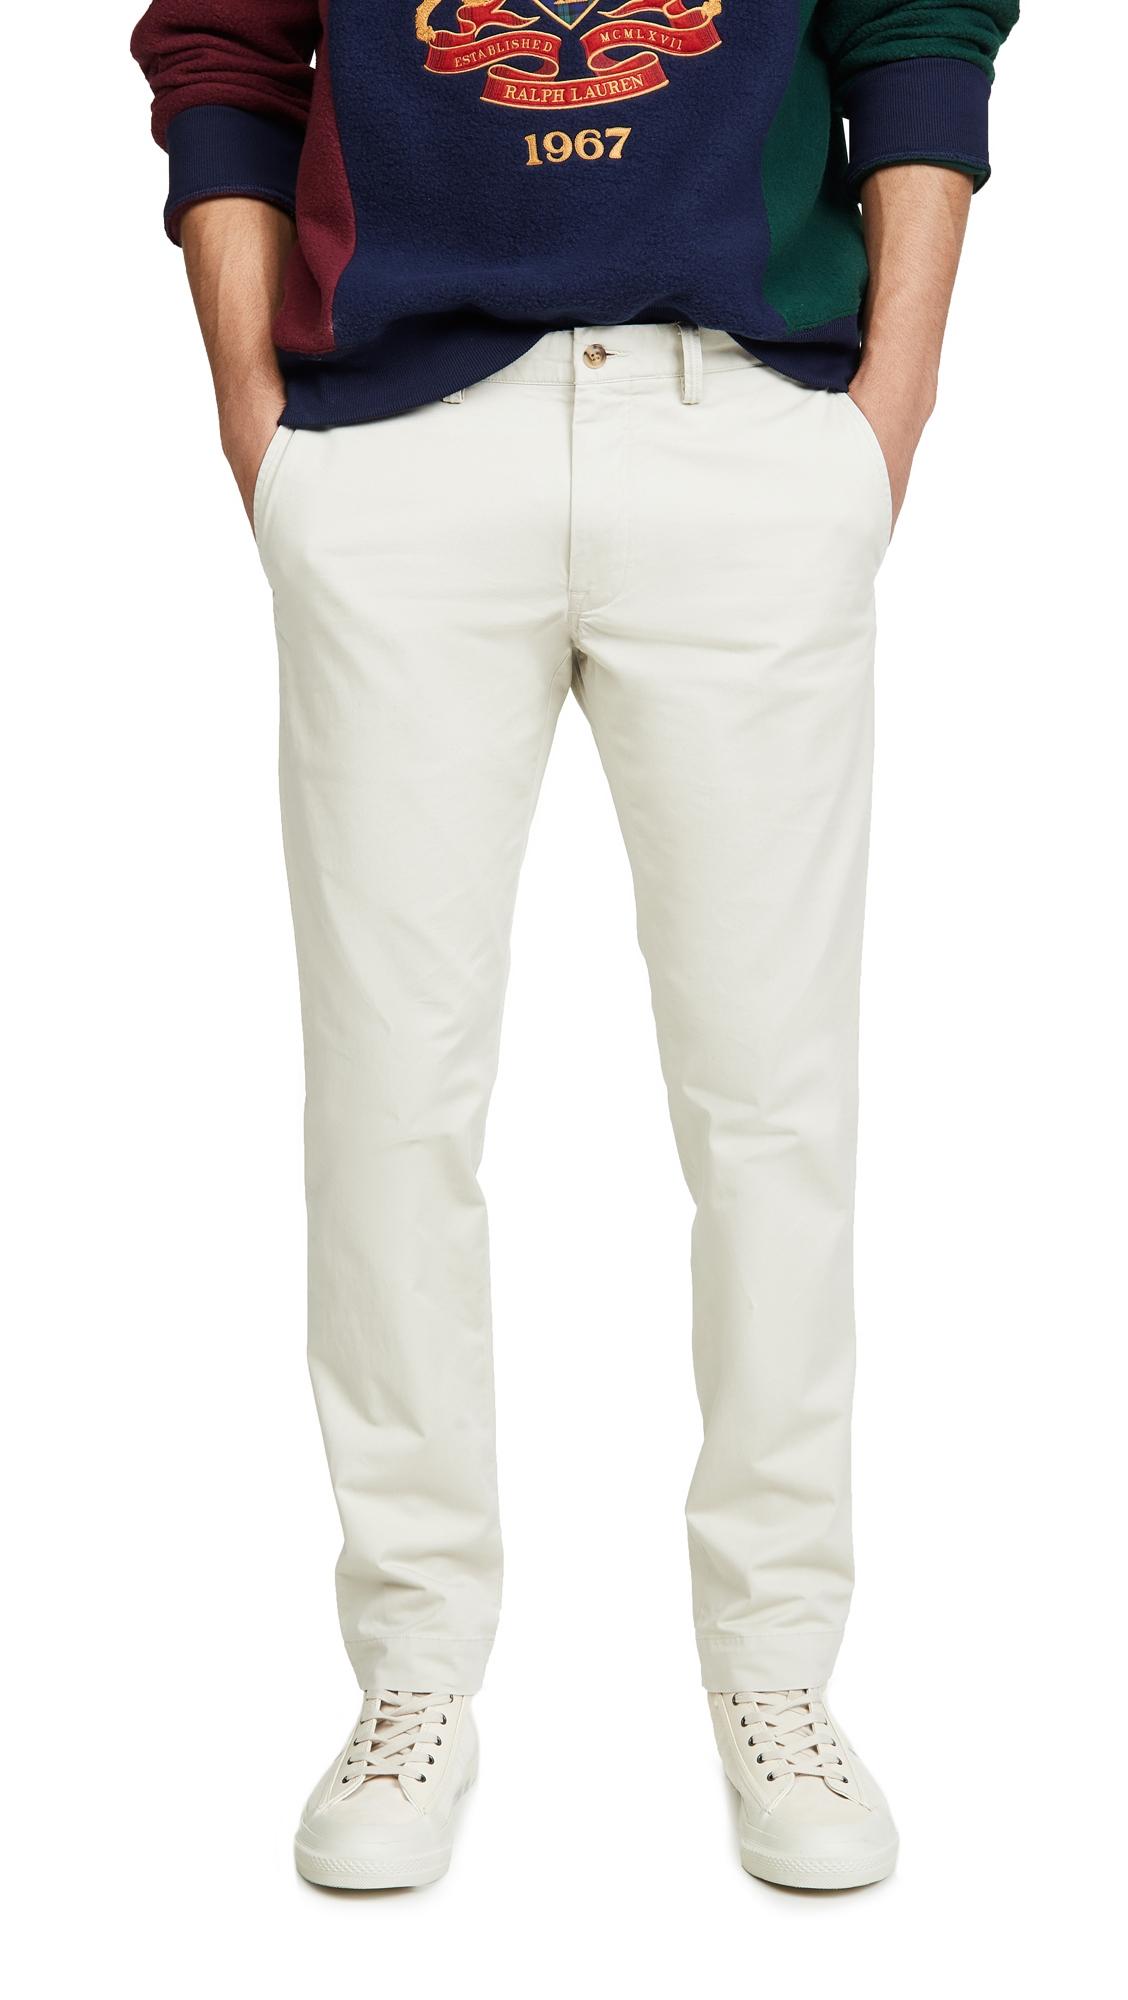 Polo Ralph Lauren Slim Fit Stretch Chino Pants